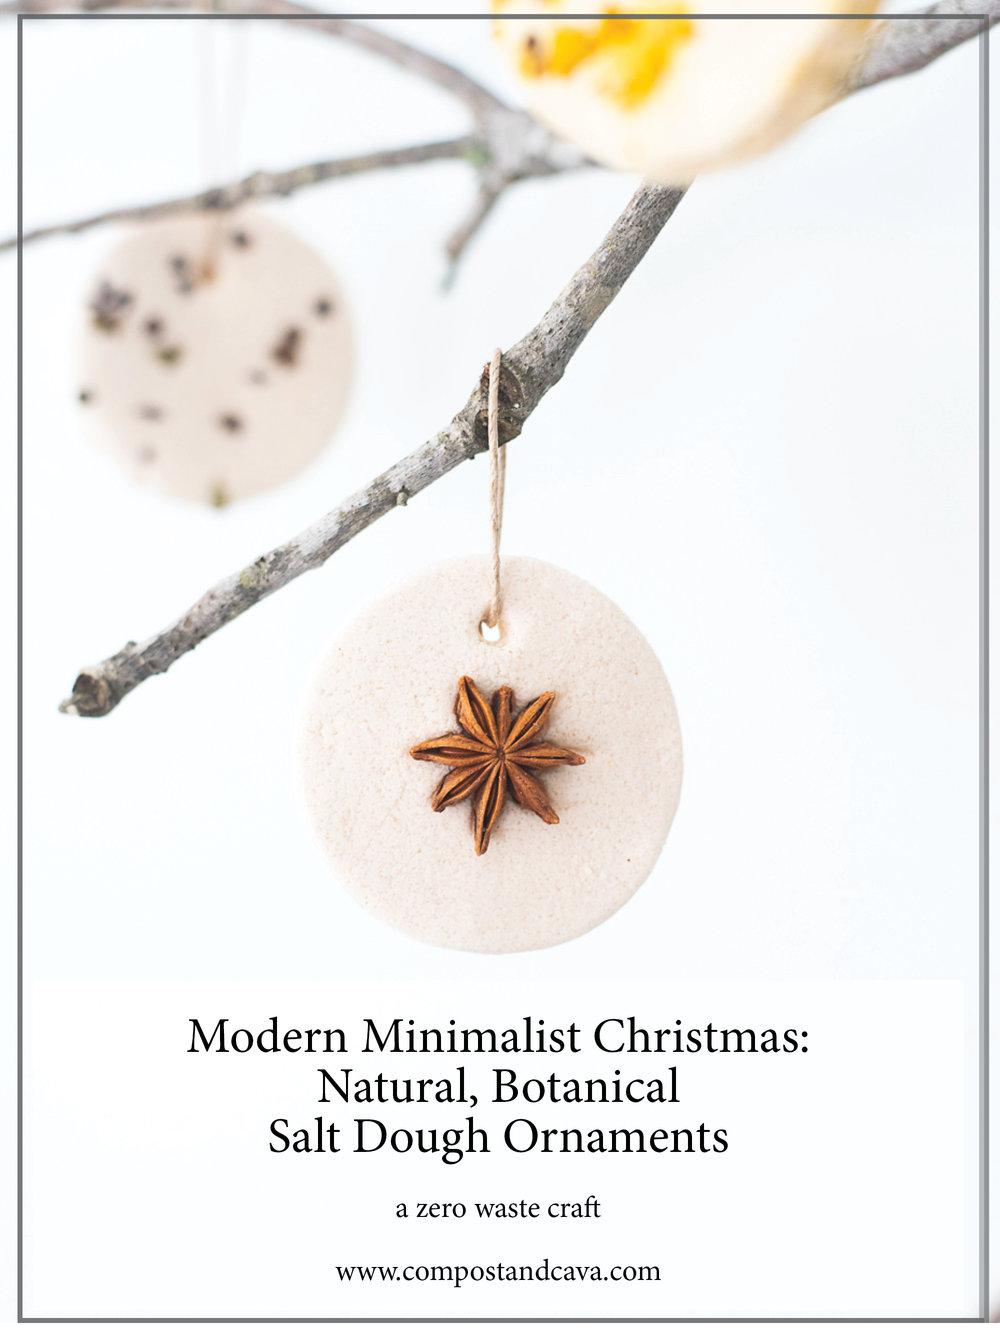 Modern Minimalist Christmas: Natural, Botanical Salt Dough Ornaments